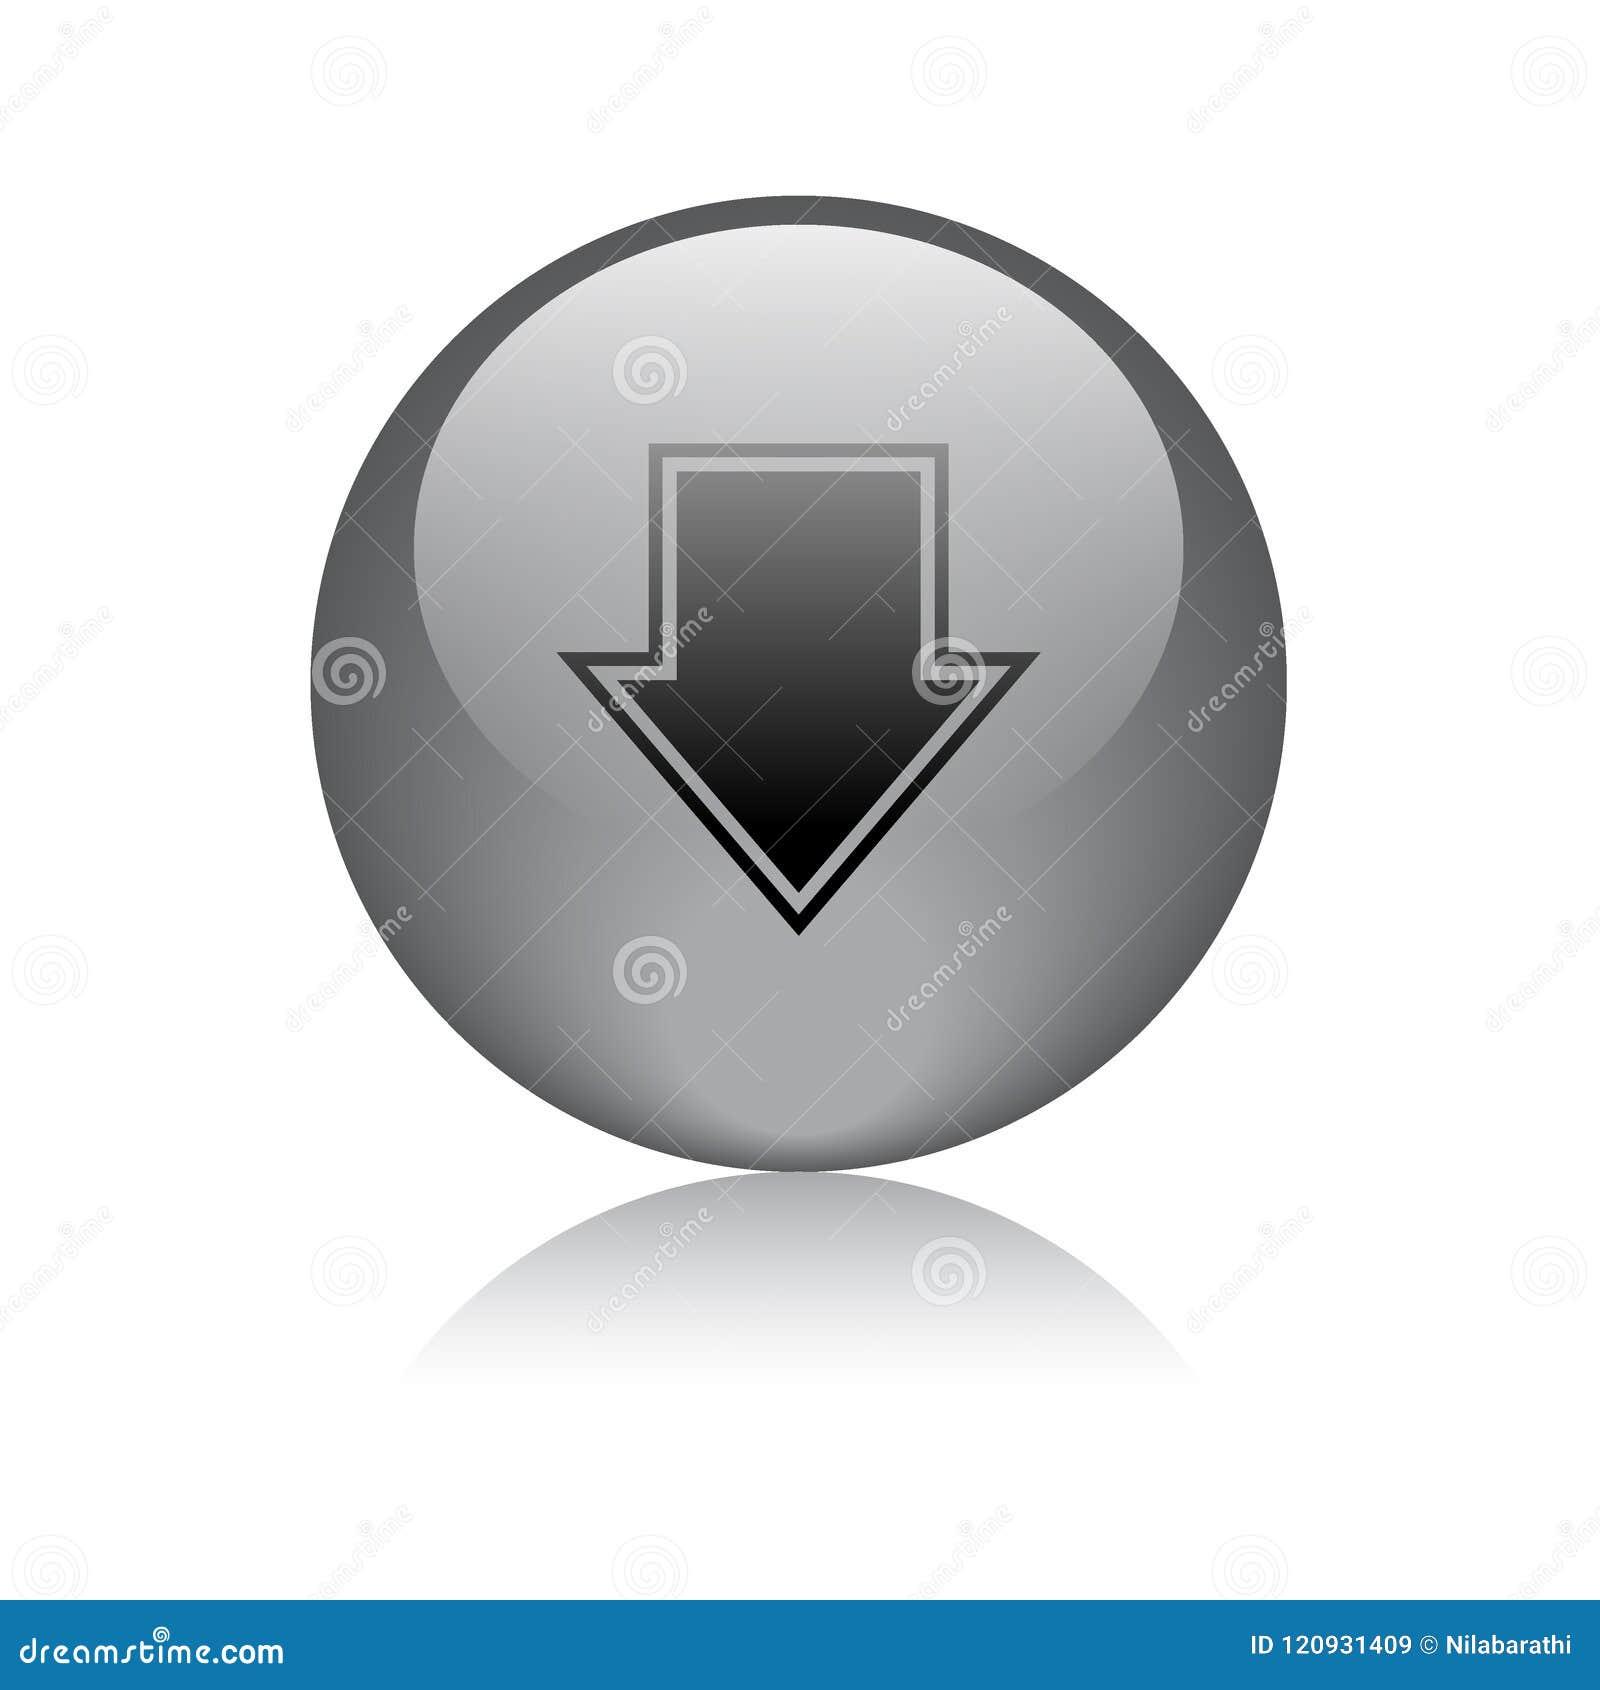 Download button black